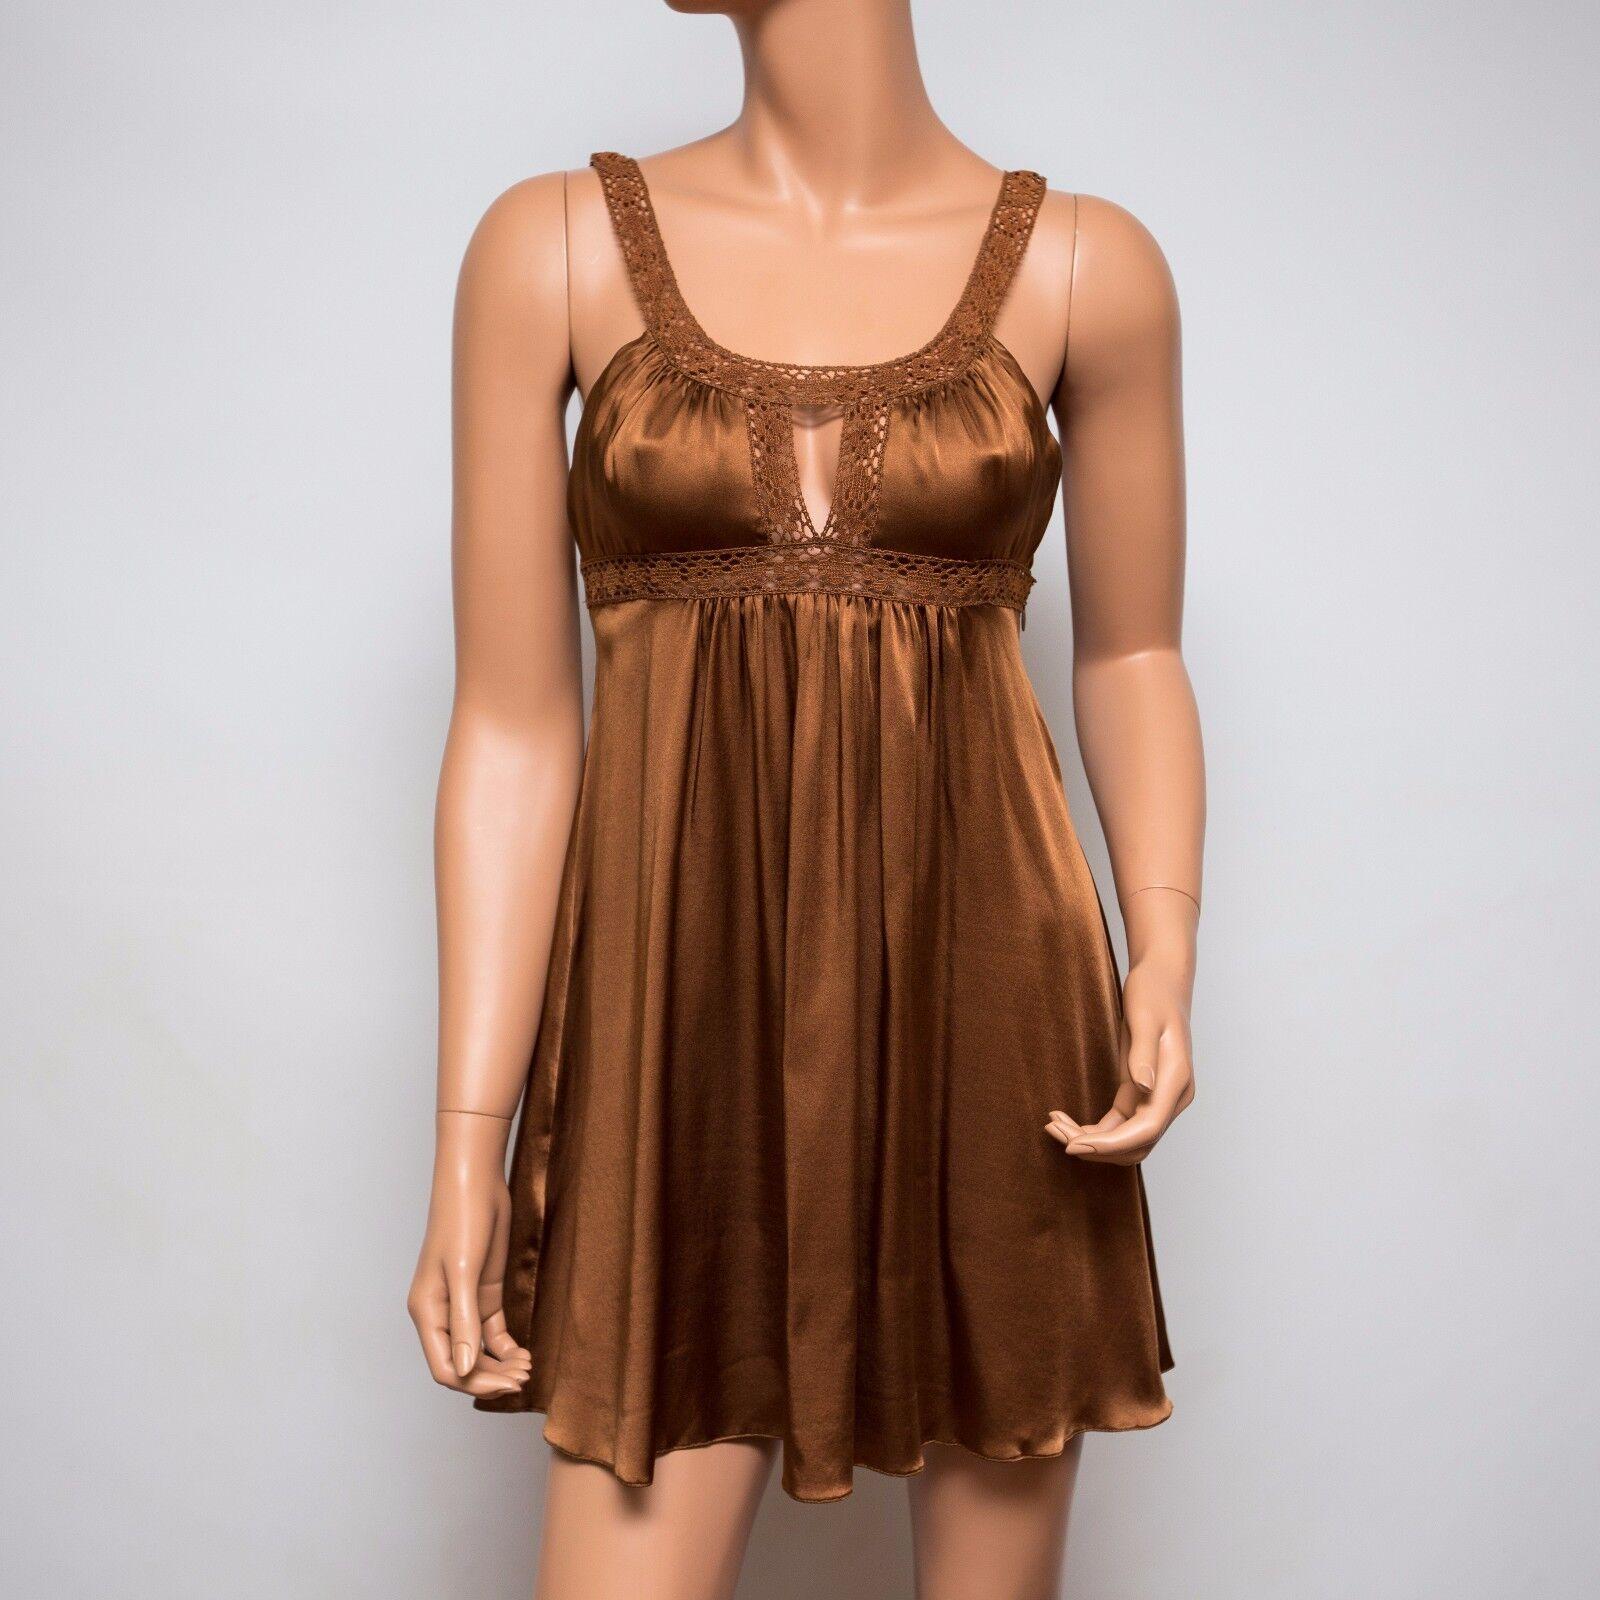 NWT NWT NWT Ingwa Melero Dulce Charmeuse Silk Bella Dress 61 CBD  280 XS 89d185